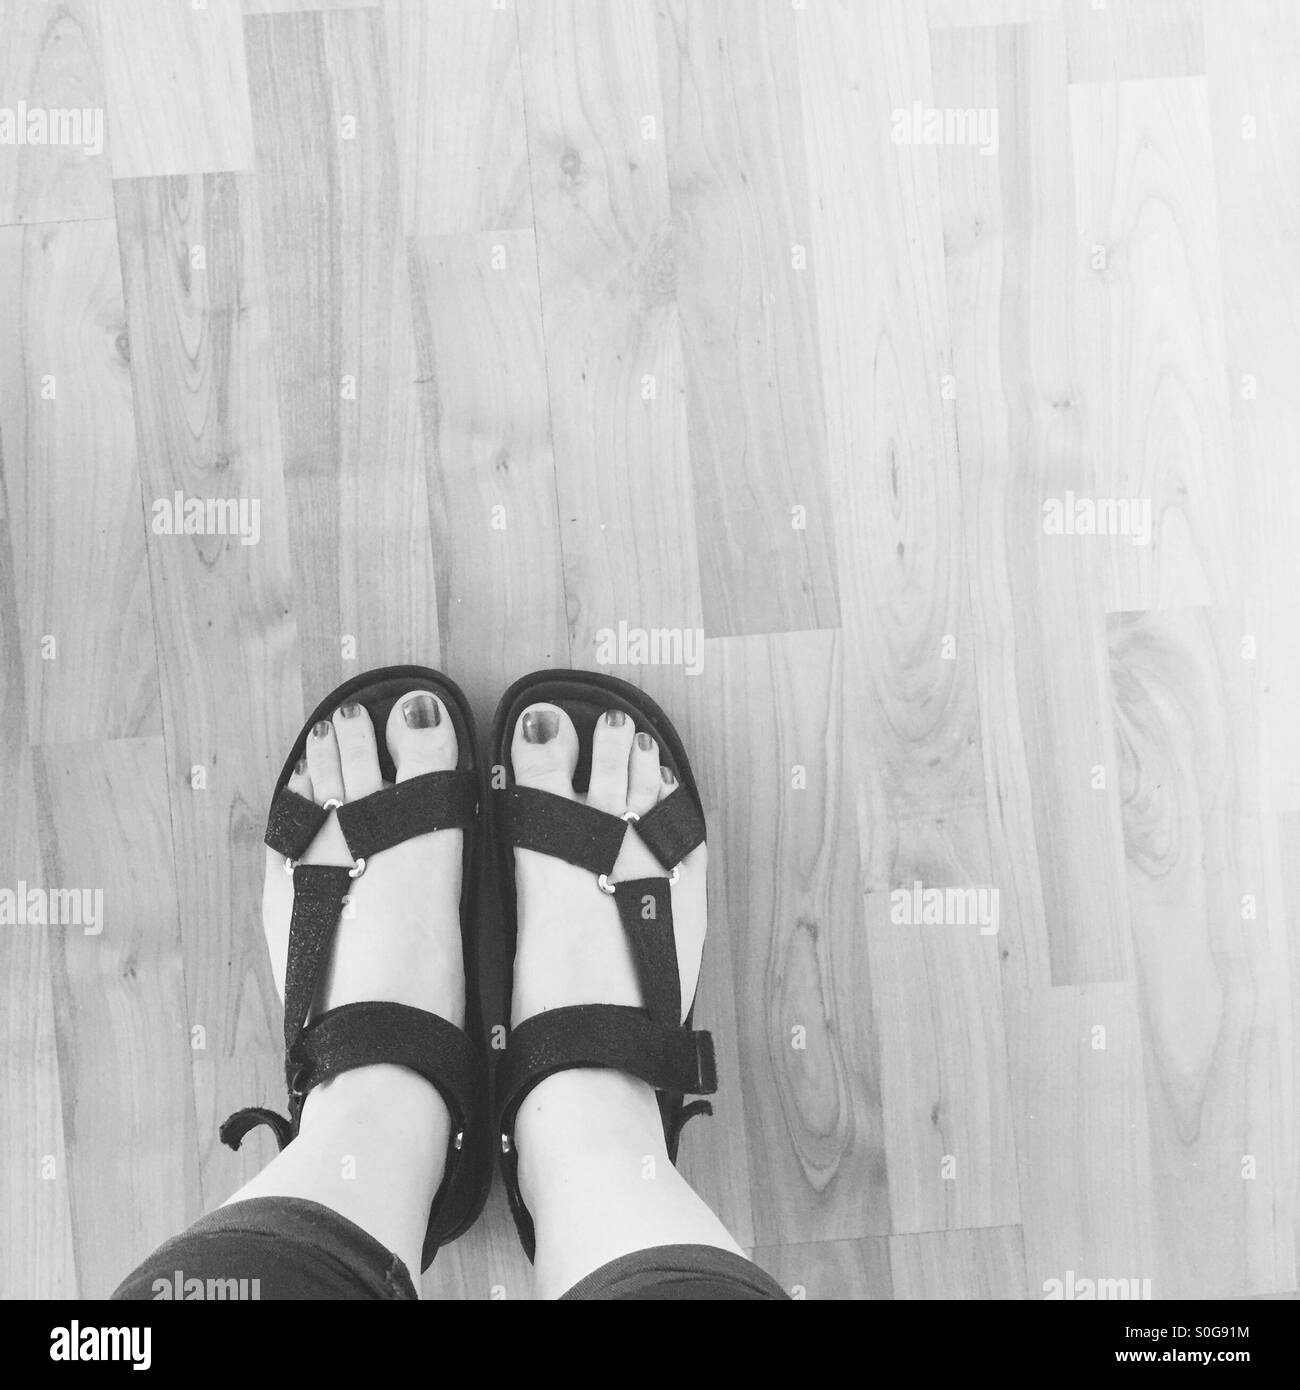 Black and white feet - Stock Image